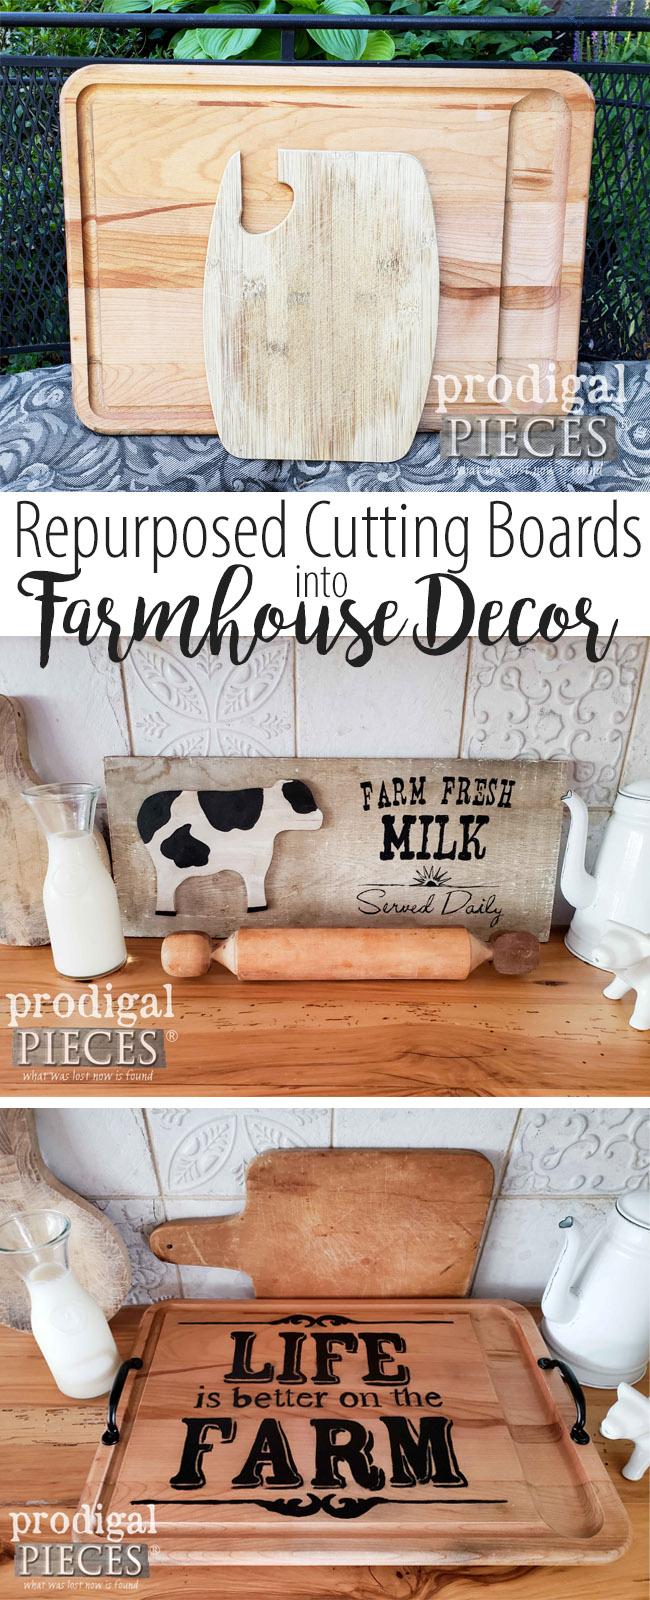 Old cutting boards repurposed into adorable farmhouse decor